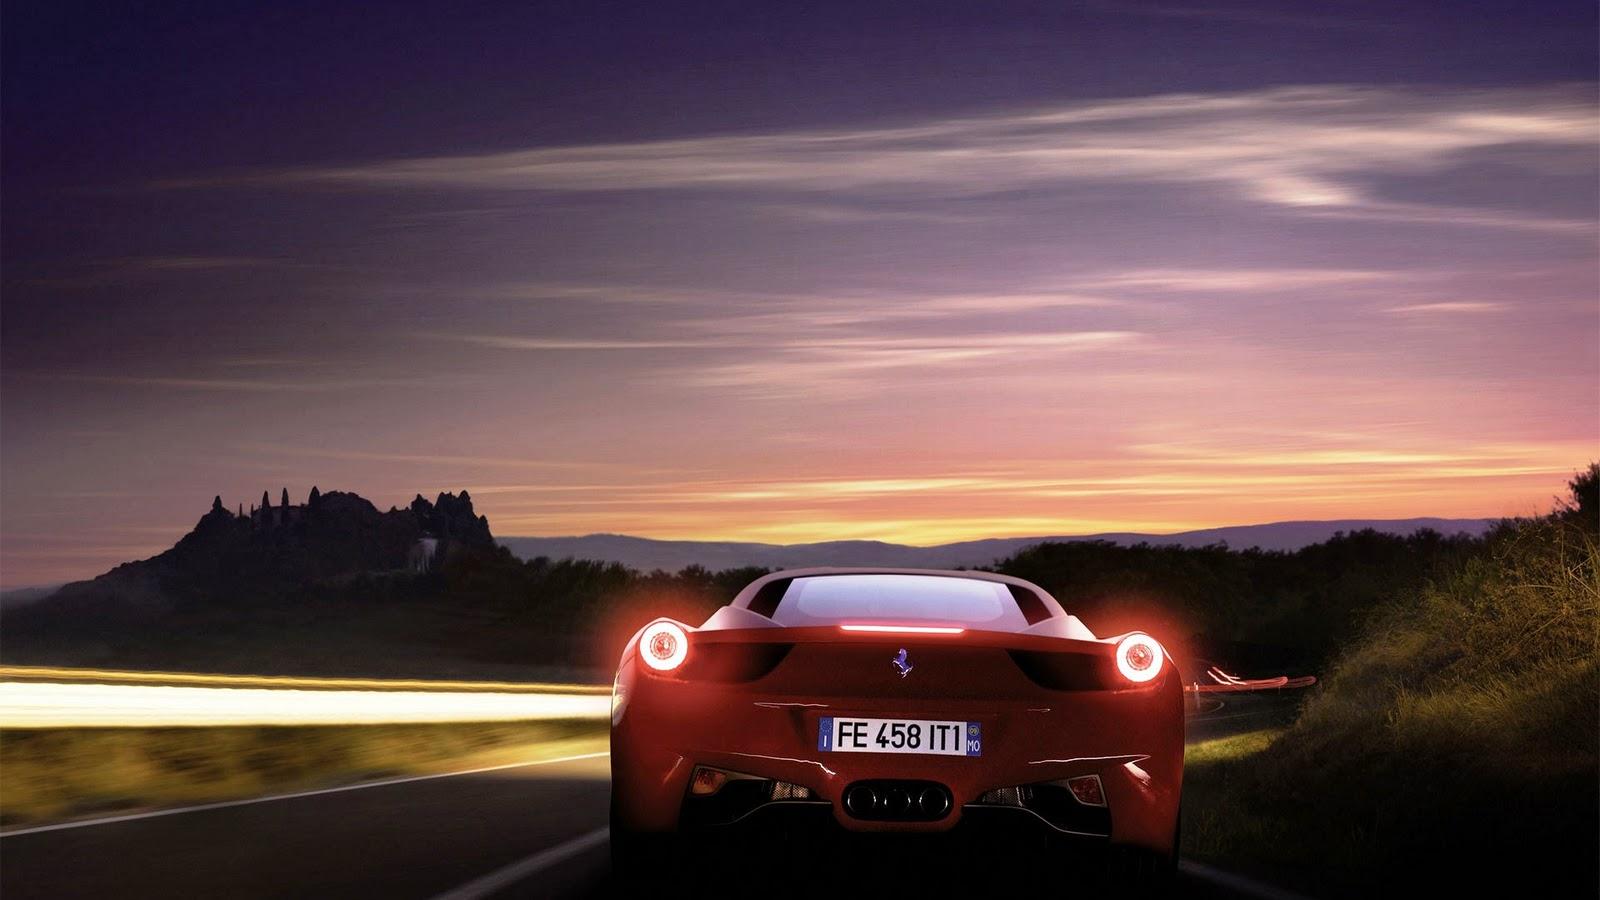 http://3.bp.blogspot.com/-_dDDu_q3vbM/TqYY9zoKUII/AAAAAAAAAoA/U_PfvvwpKz0/s1600/Ferrari_458_Italiax_2011_07.jpg